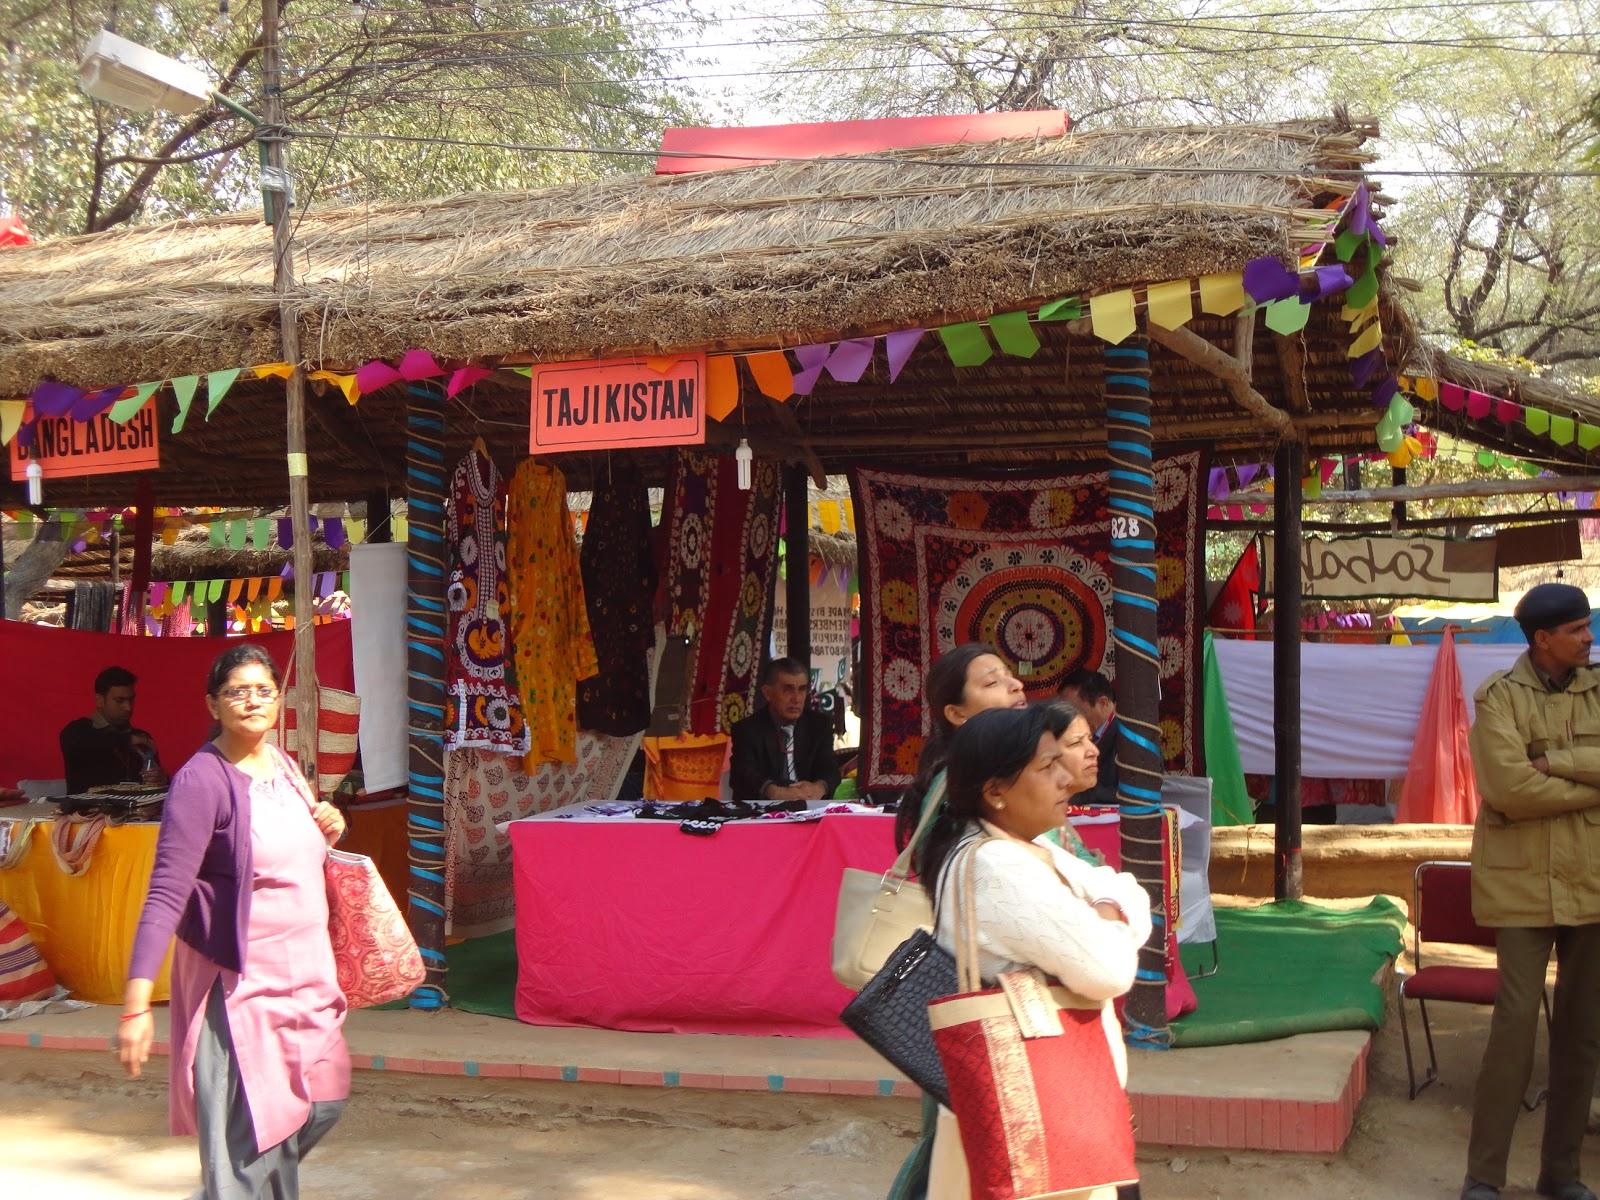 Tajakistan Stall at Surajkund Crafts Mela,India